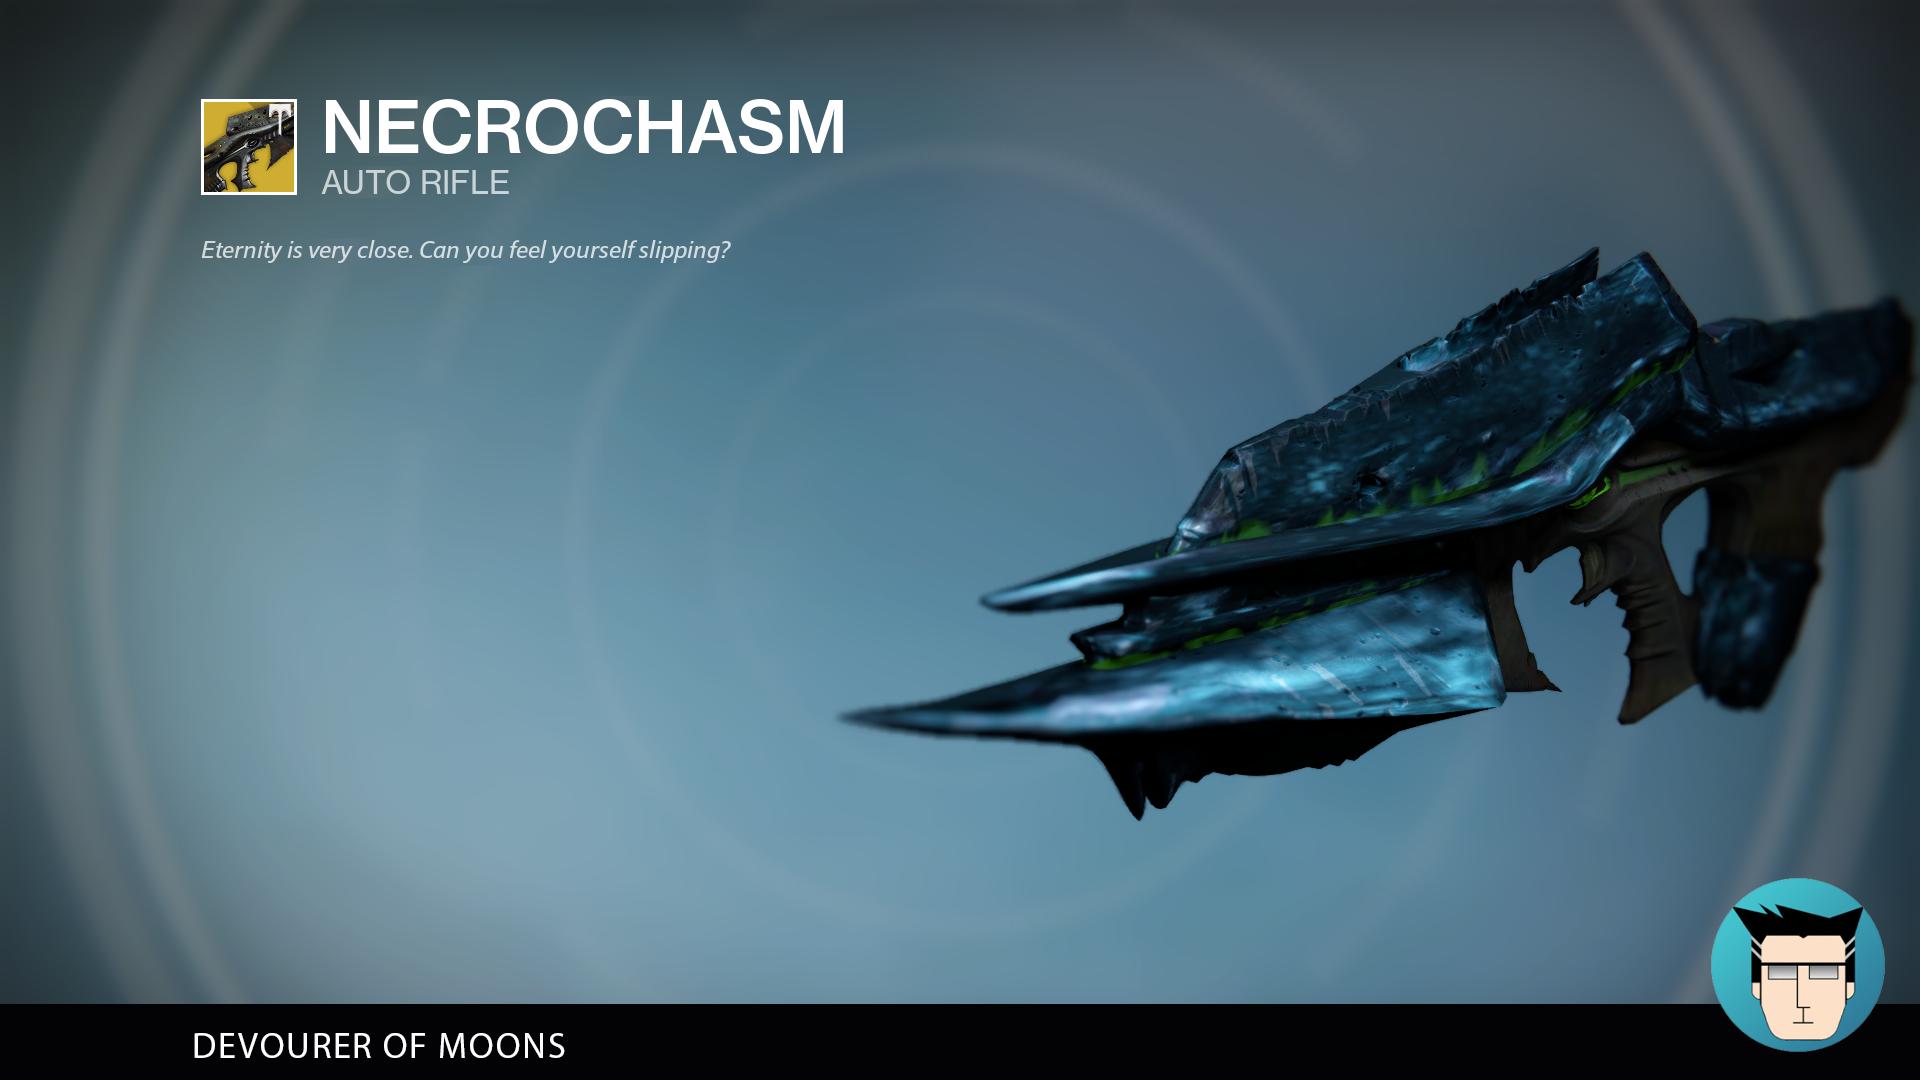 NECROCHASM | DEVOURER OF MOONS